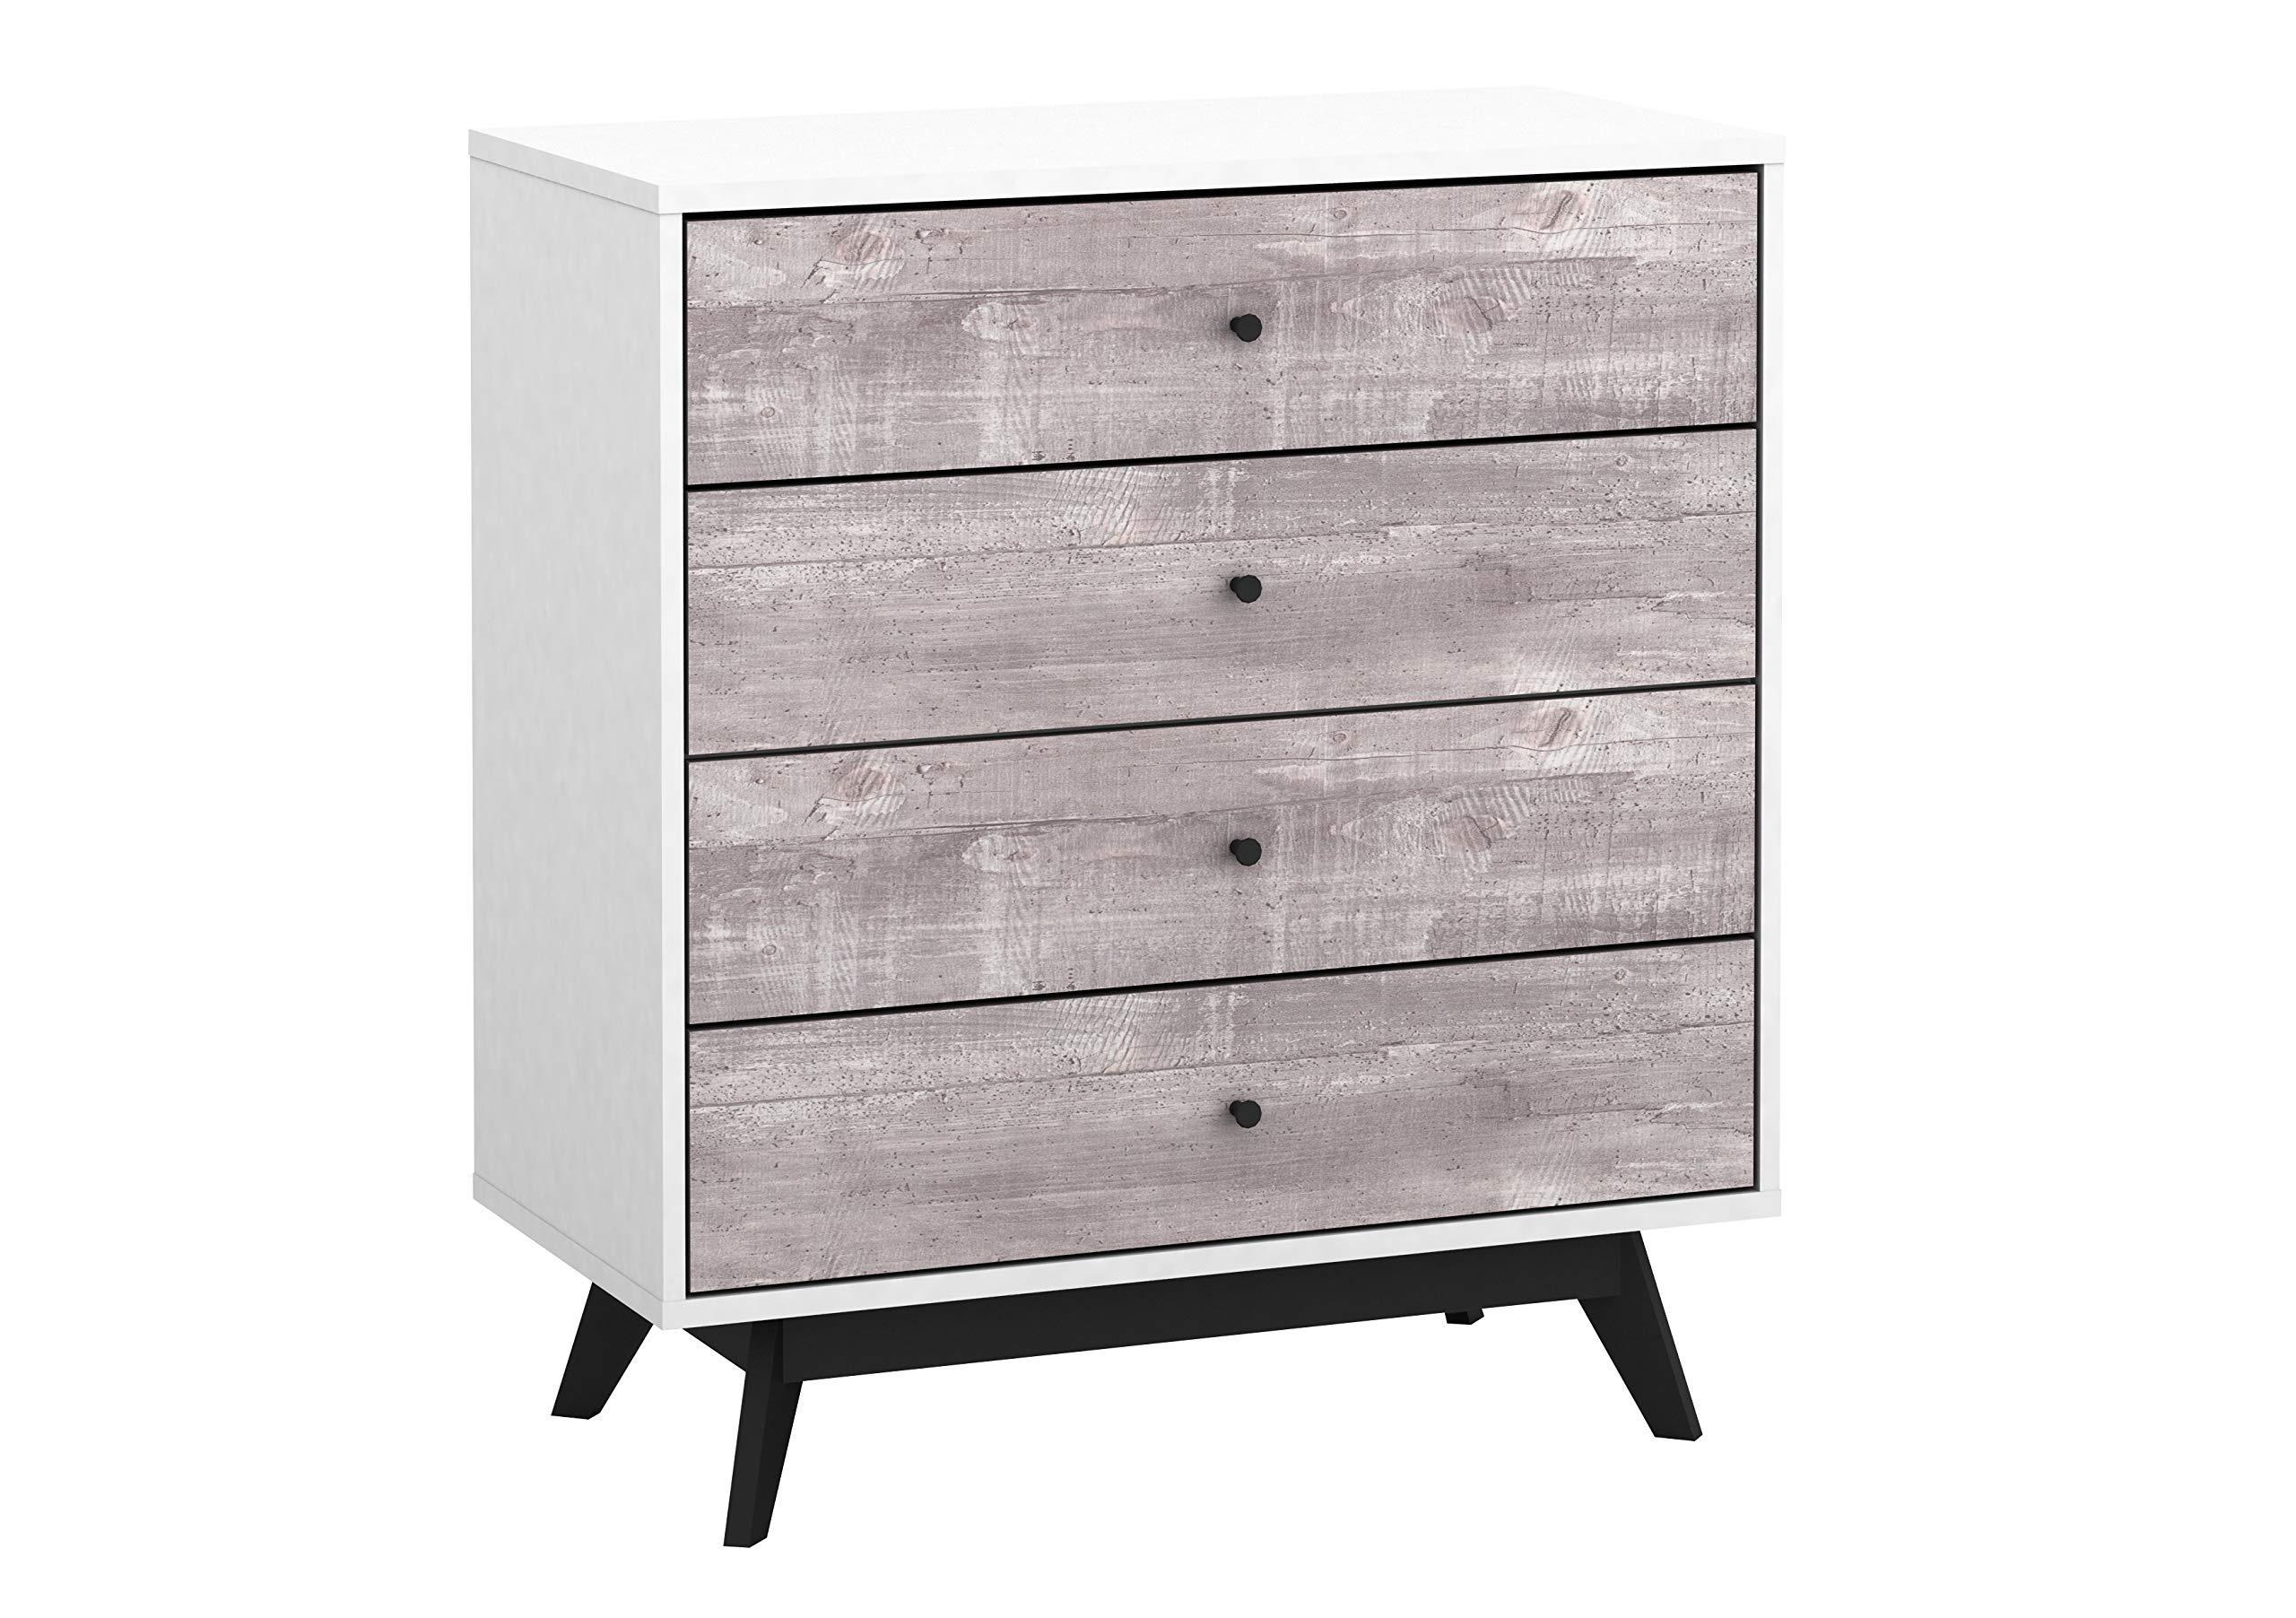 The Mezzanine Shoppe Crislana Ultra Modern 4 Drawer Bedroom Chest Dresser, 31.5'', Gray by The Mezzanine Shoppe